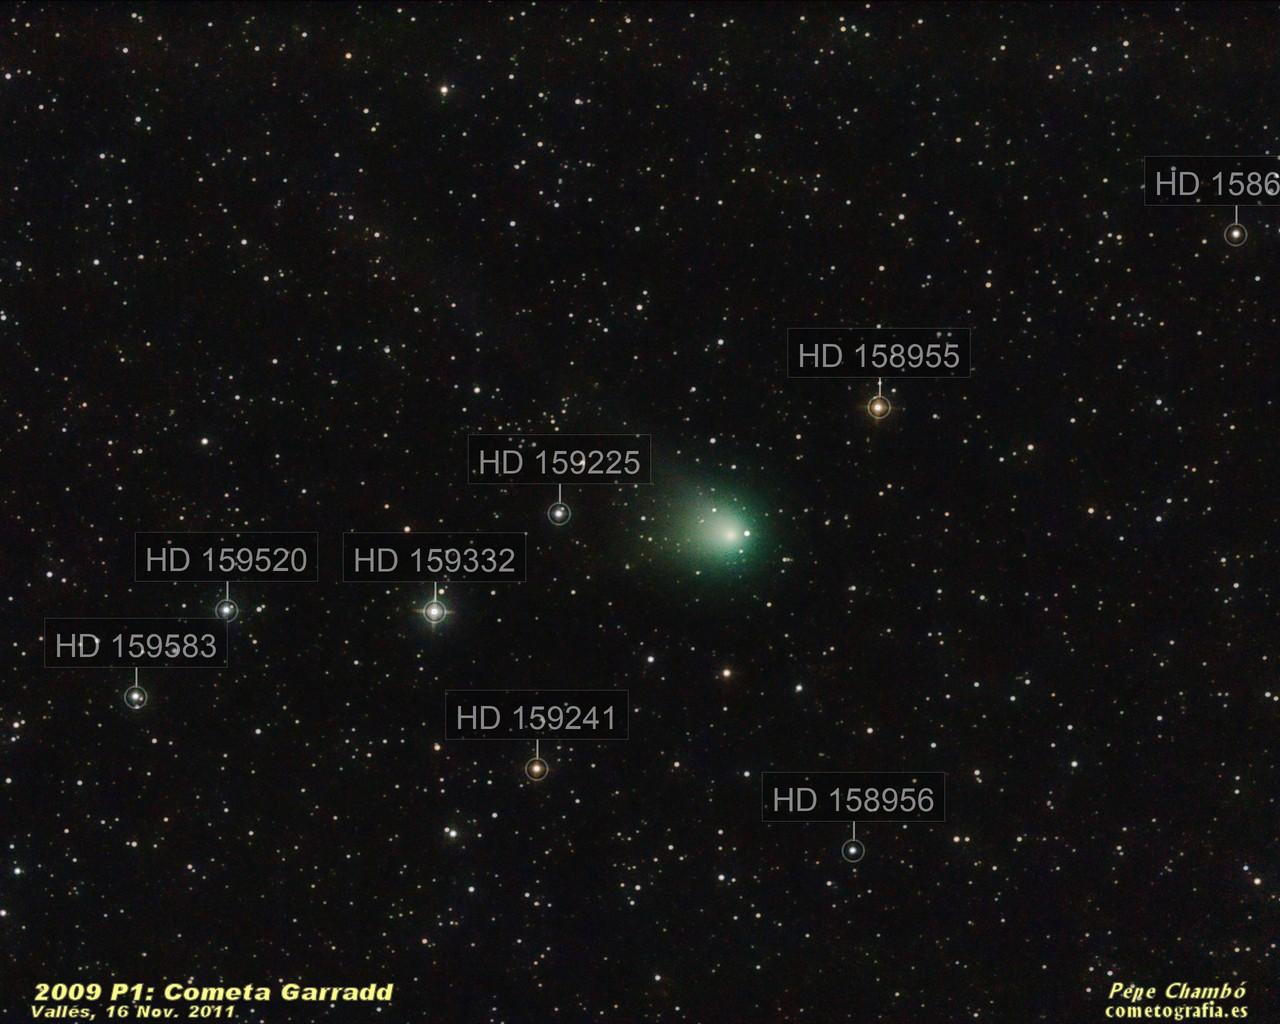 Comet Garradd in mid November